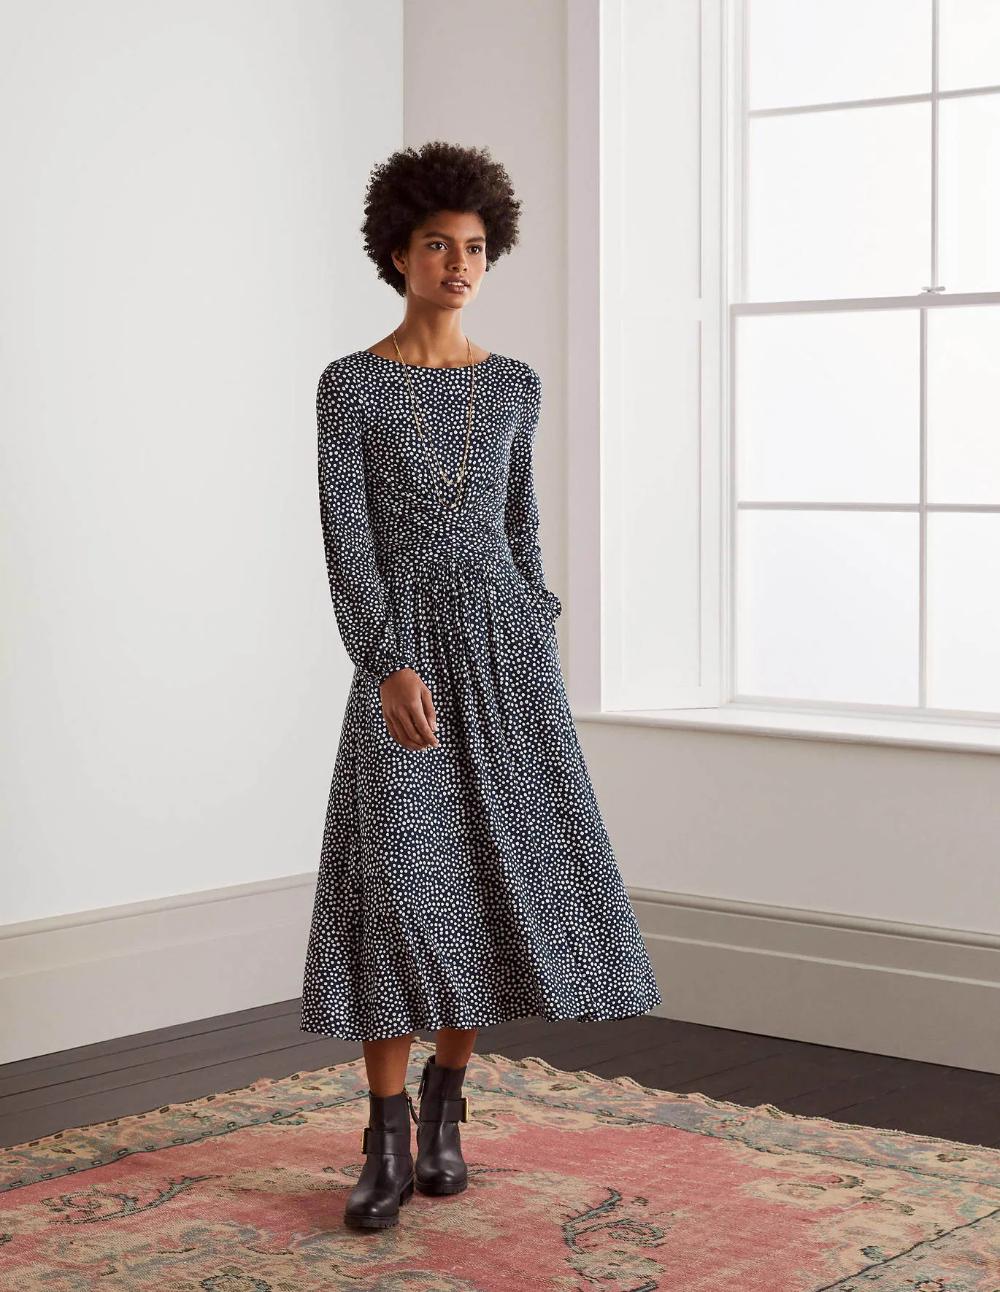 Frances Jersey Midi Dress Khaki Khaki Dress Midi Dress Inspired Dress [ 1292 x 1000 Pixel ]